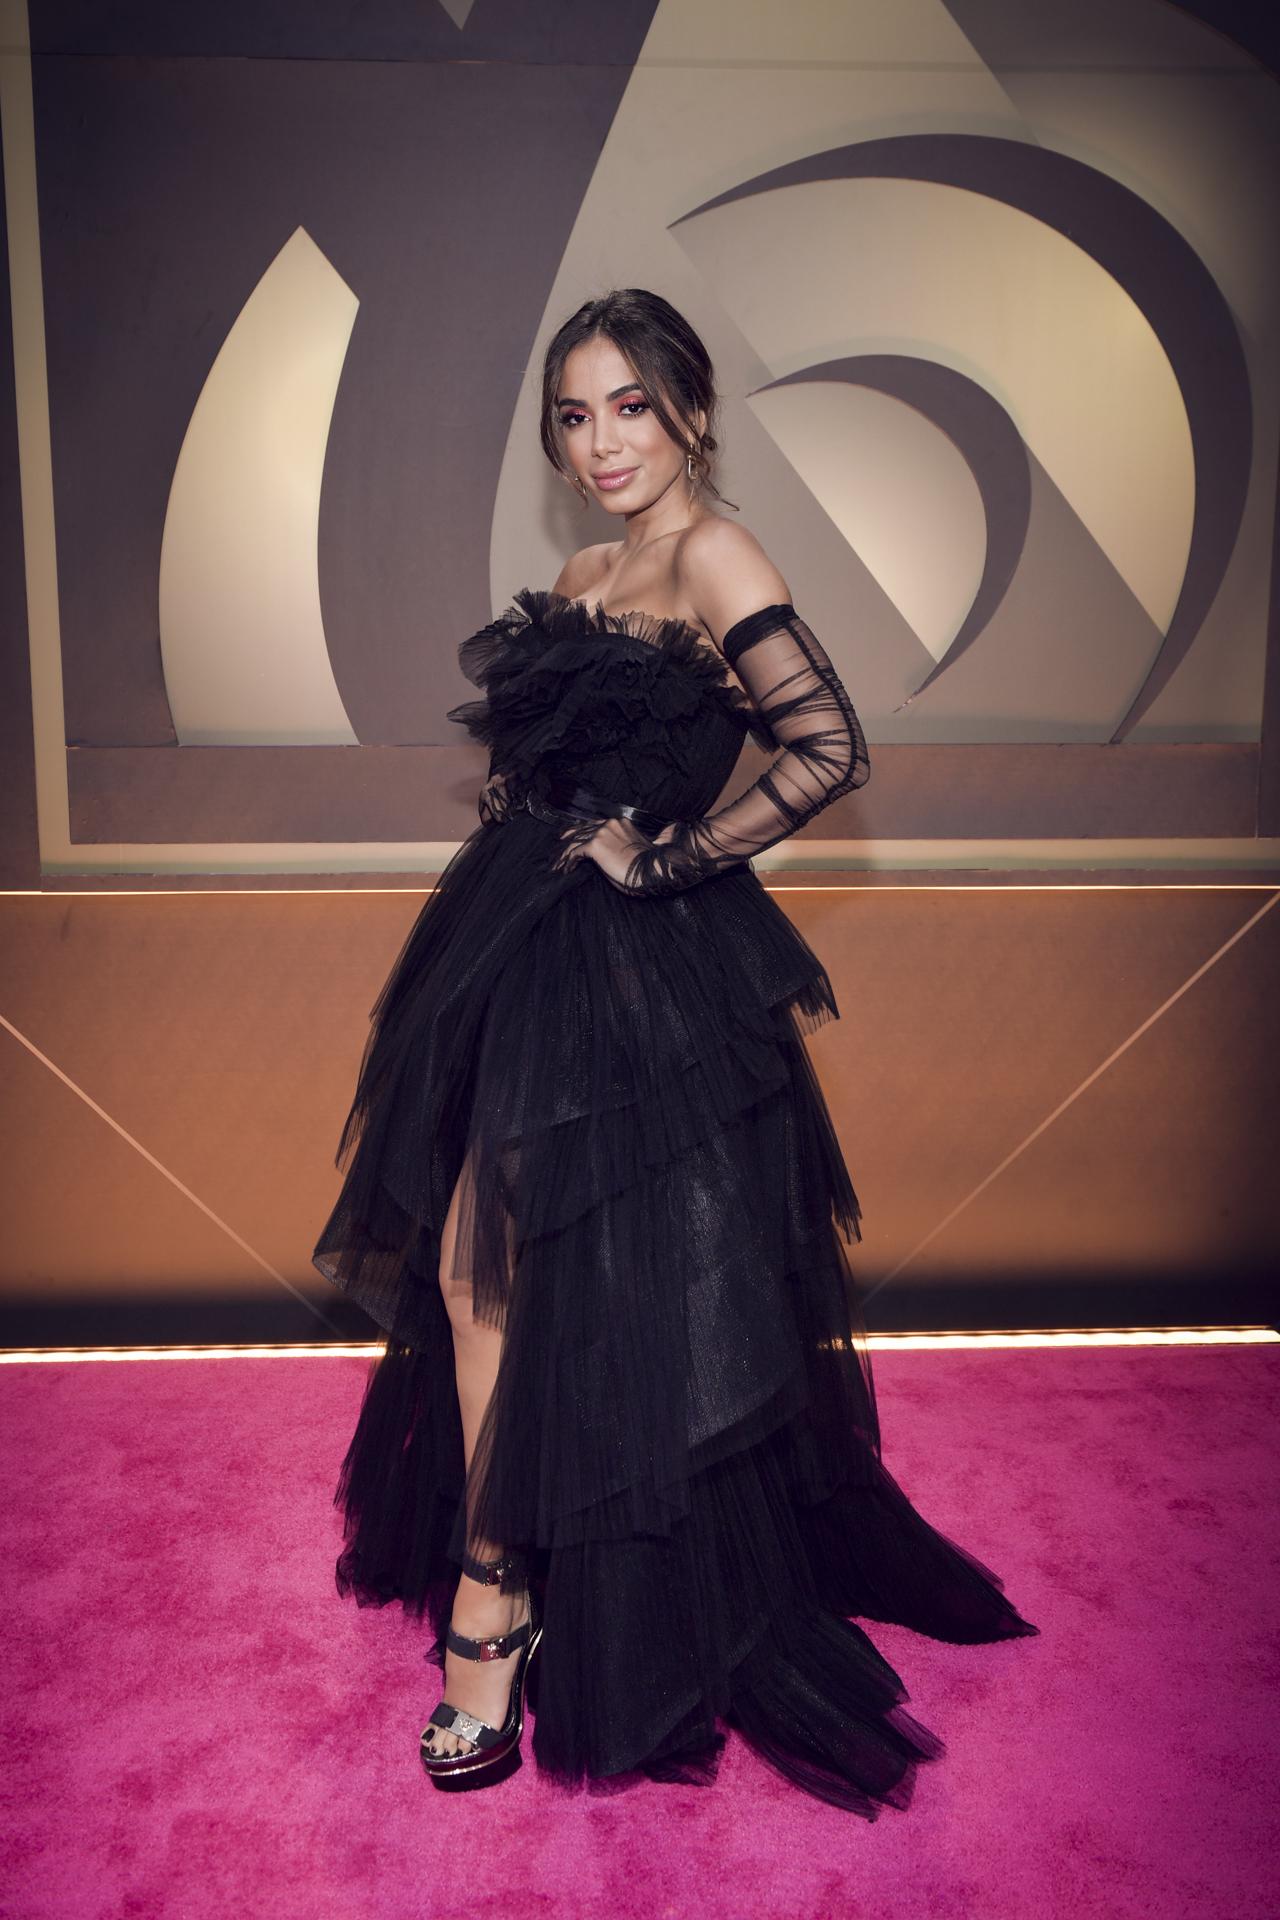 La cantante brasileña Anitta. (Suministrada/ Univision)